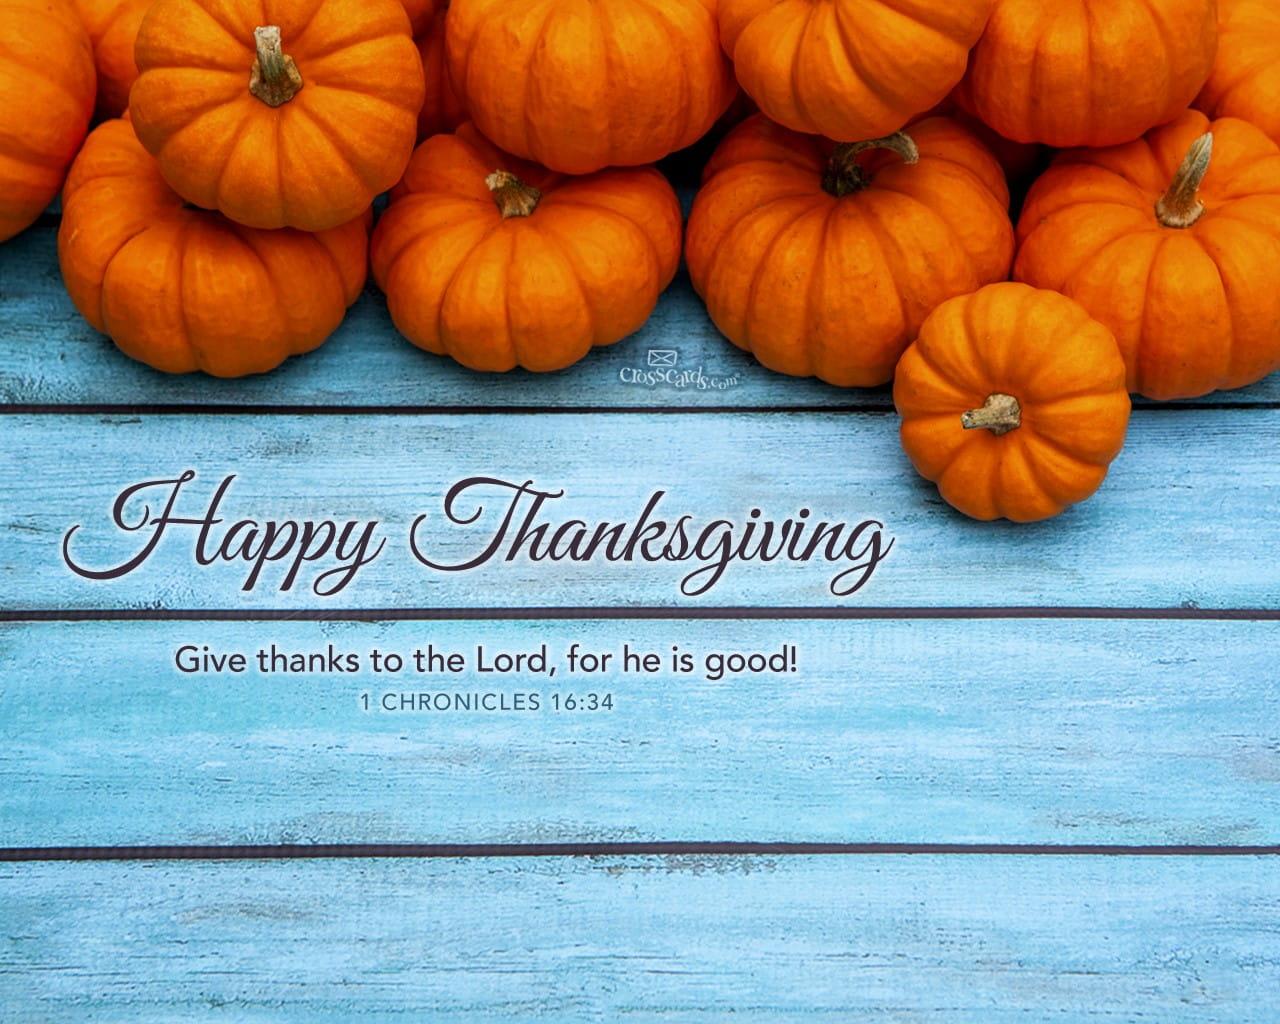 christian thanksgiving screensavers and wallpaper - photo #24